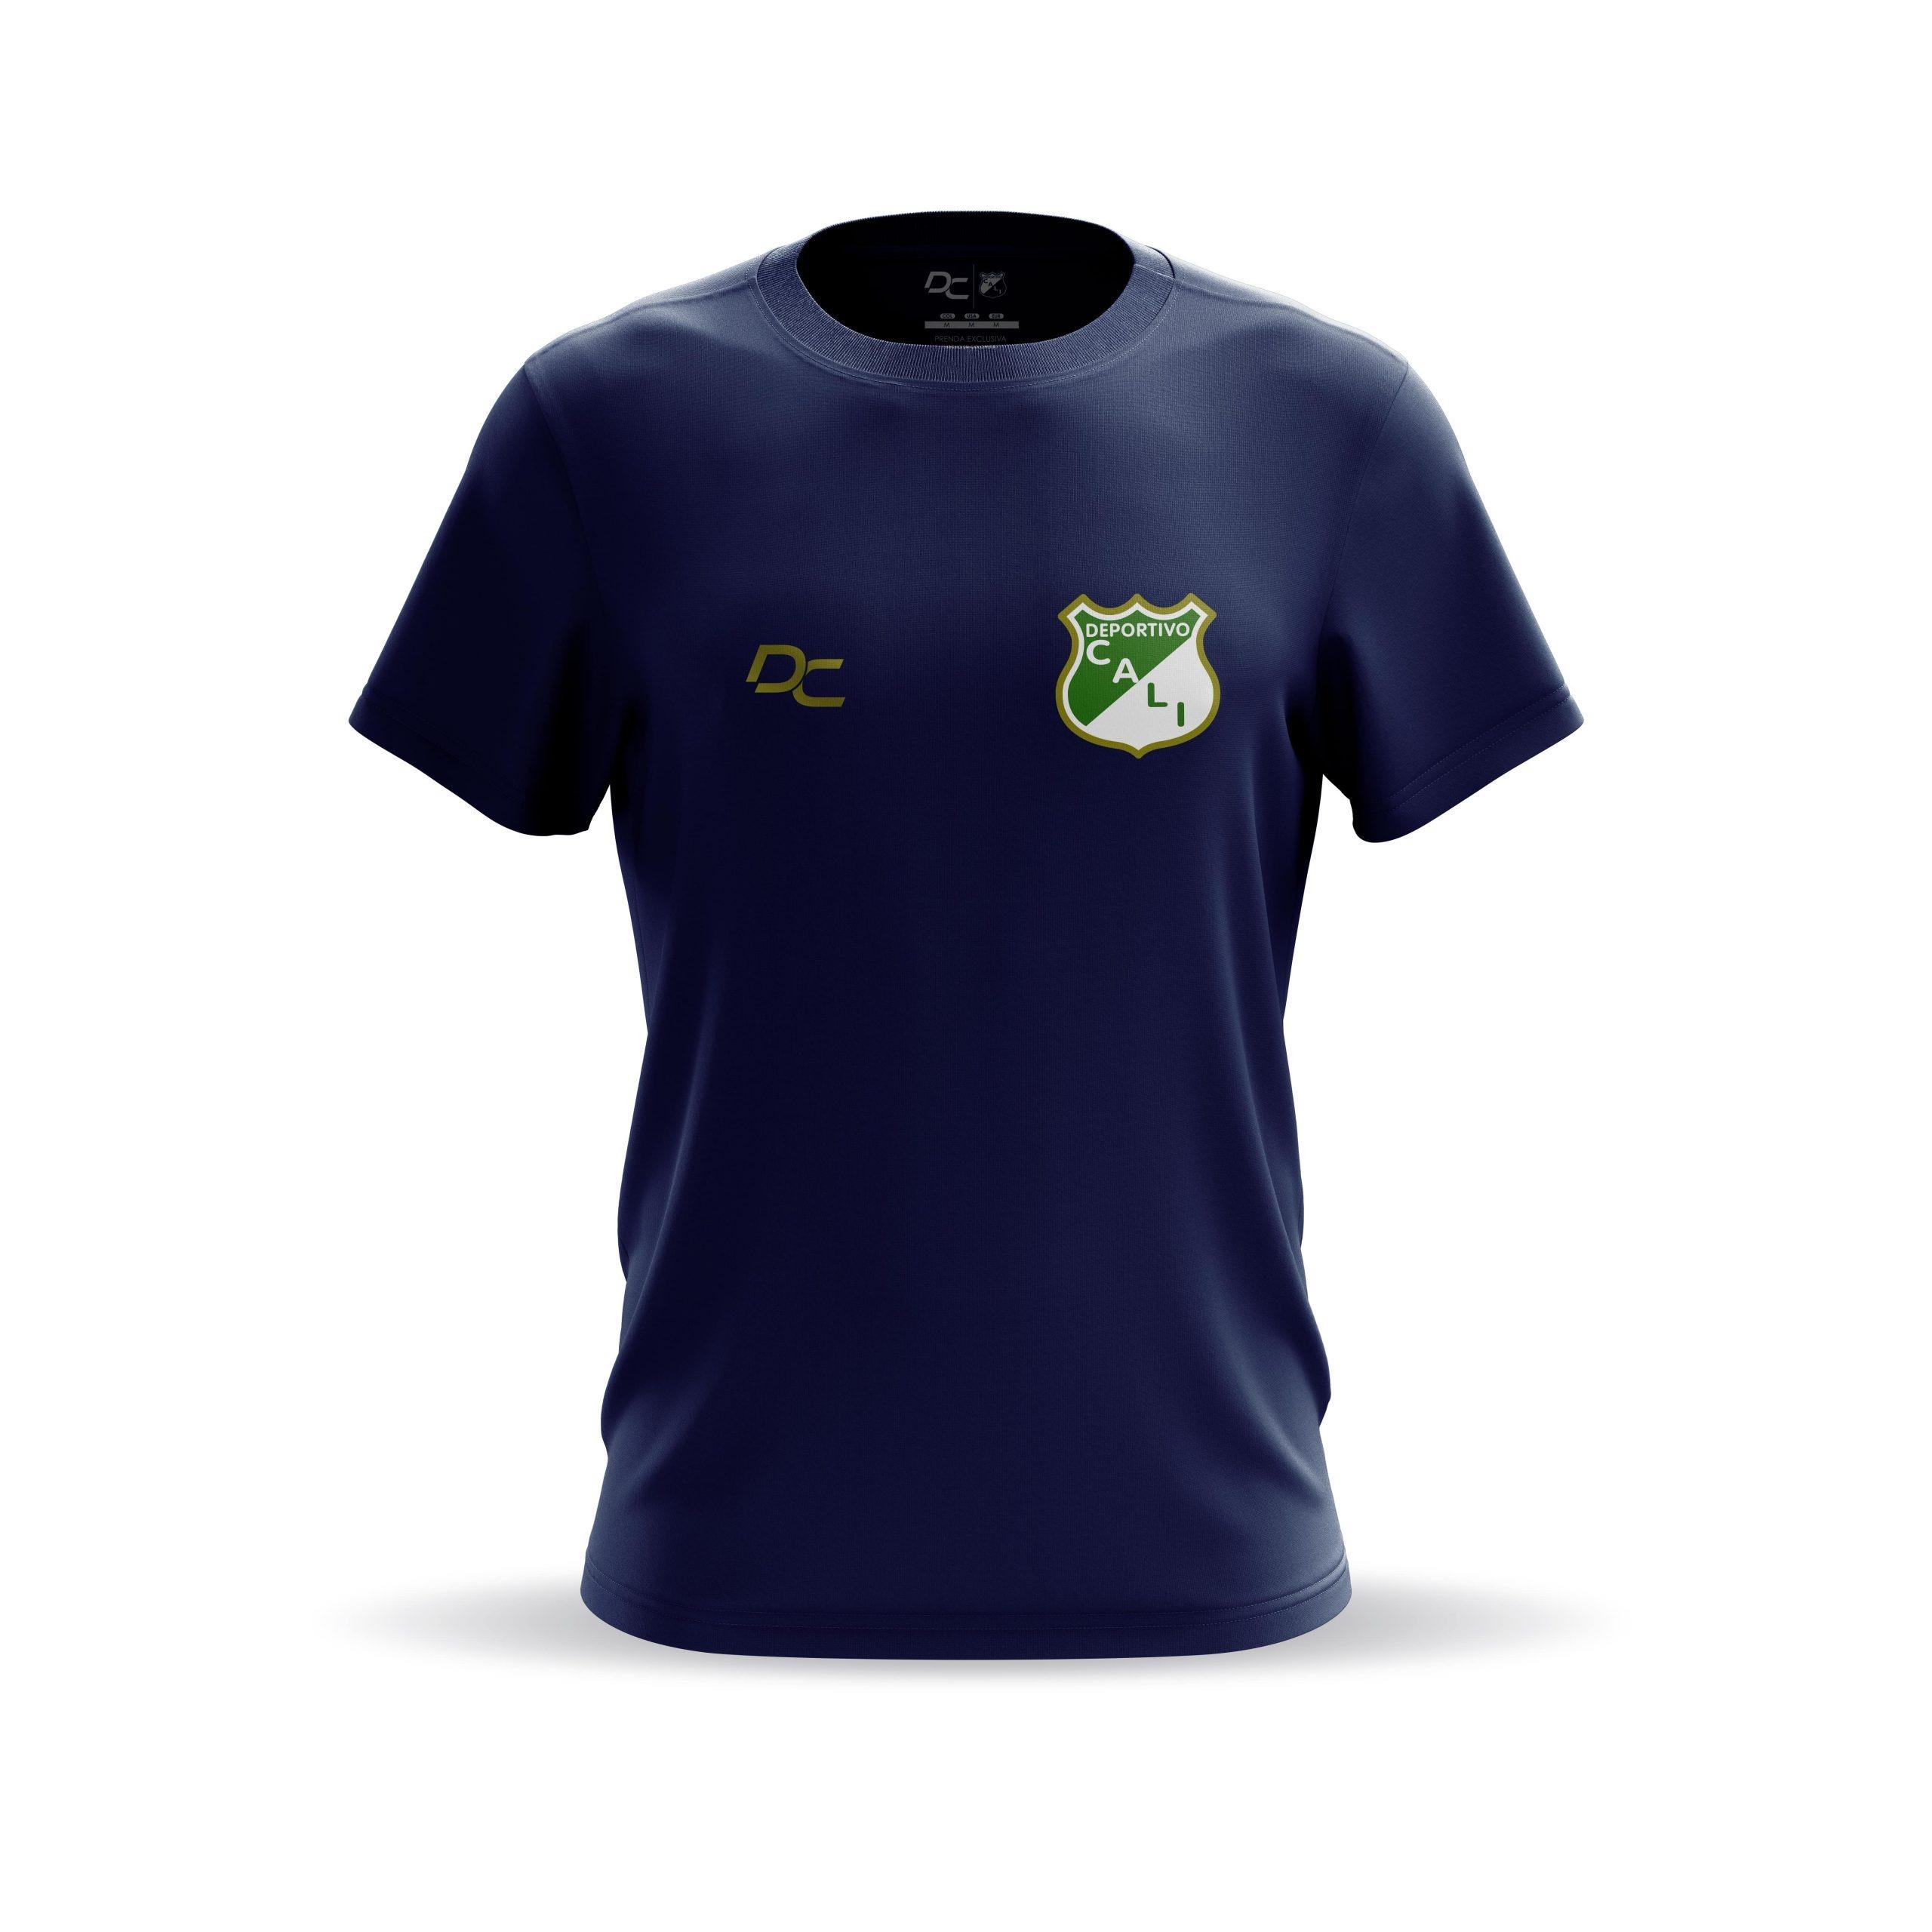 Camiseta Hombre Deportivo Cali Navy